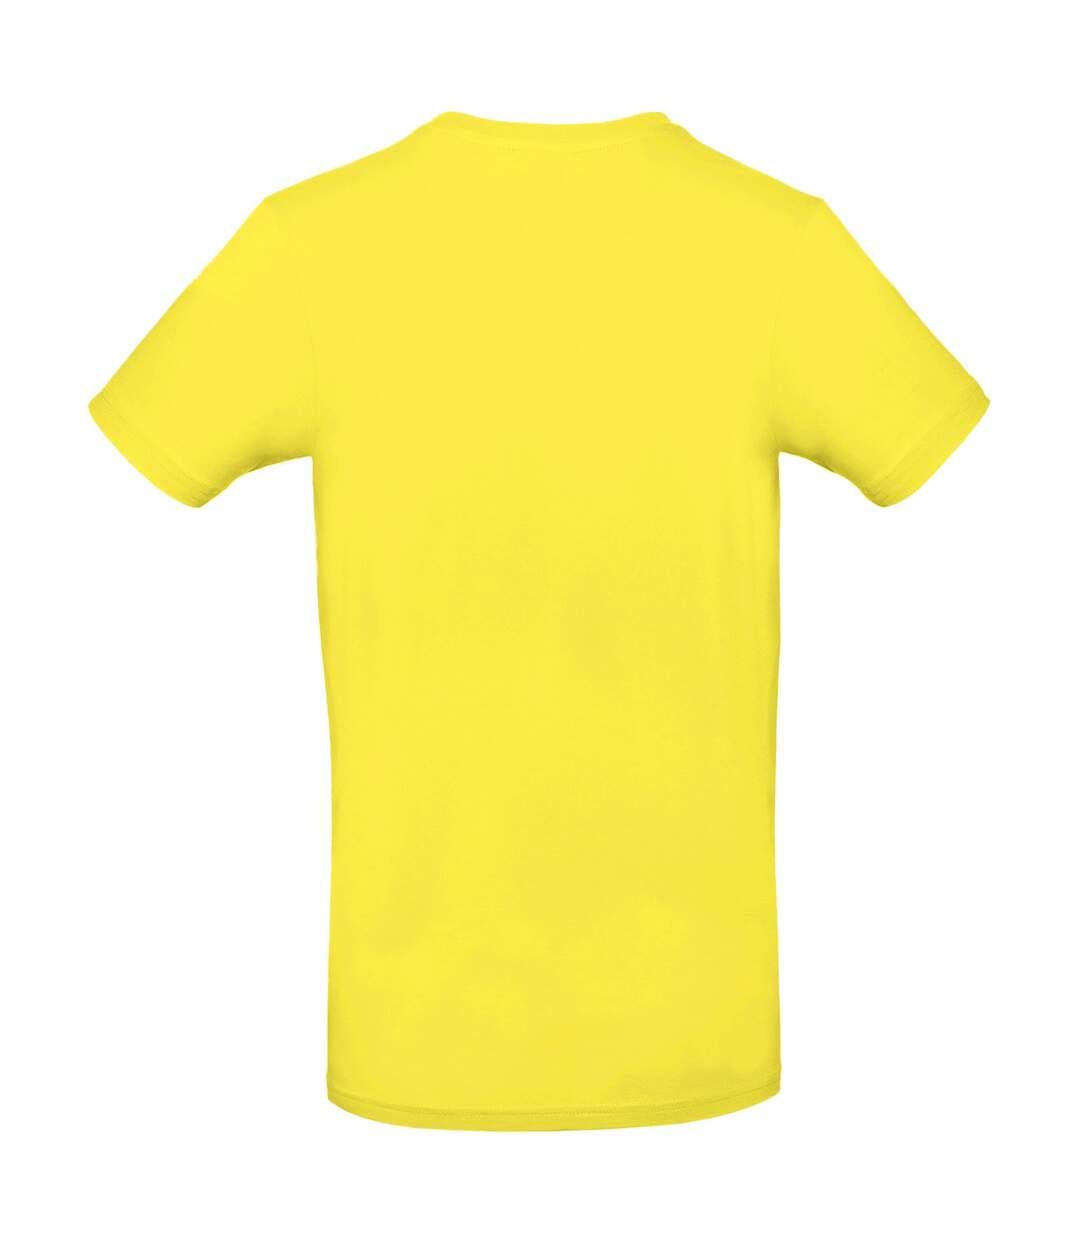 B&C Mens #E190 Tee (Sport Grey) - UTBC3911